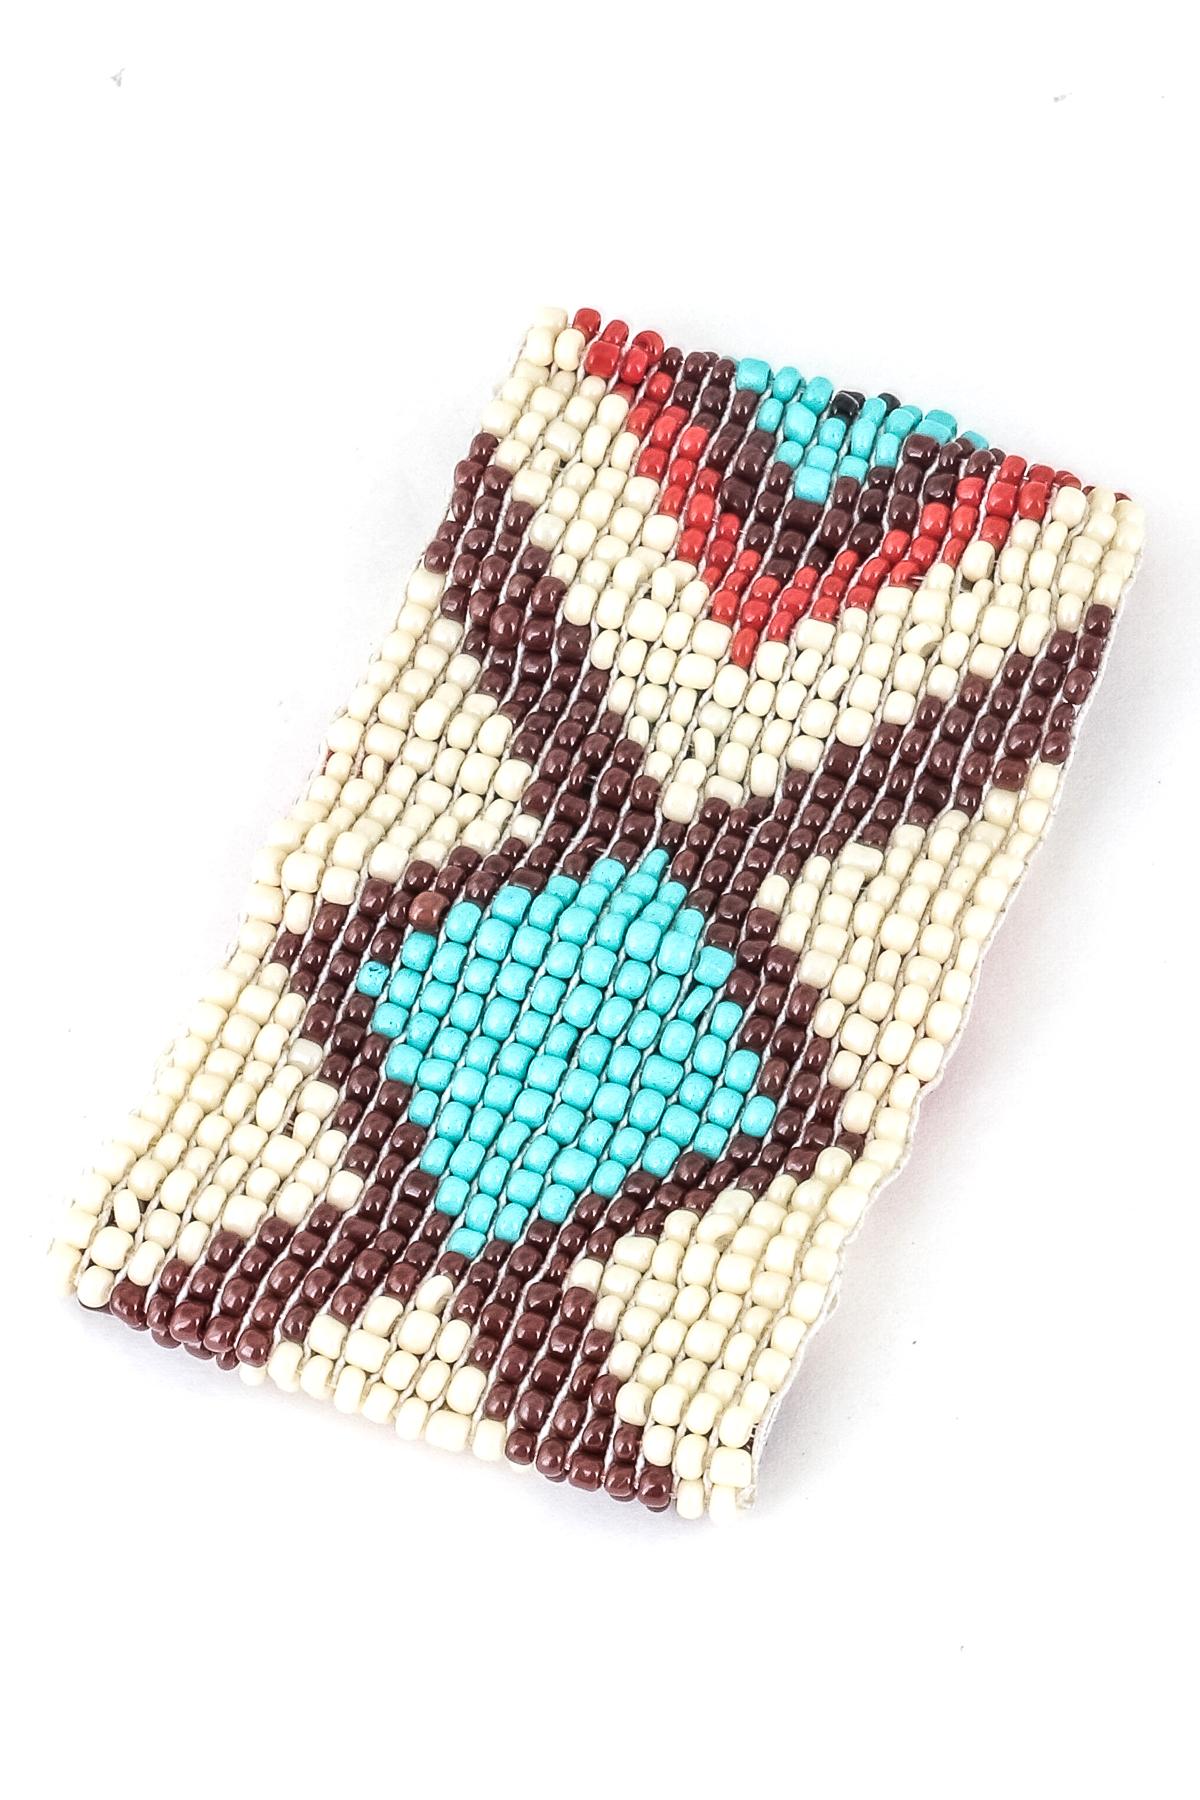 Native Seed Beed Stretch Bracelet  Bracelets. Pandora Bangle Charms. Mothers Day Bracelet. Raw Amethyst Pendant. Sell Jewelry. Nurse Necklace. Lab Diamond Necklace. Black And Gold Wedding Band. Mens Diamond Rings